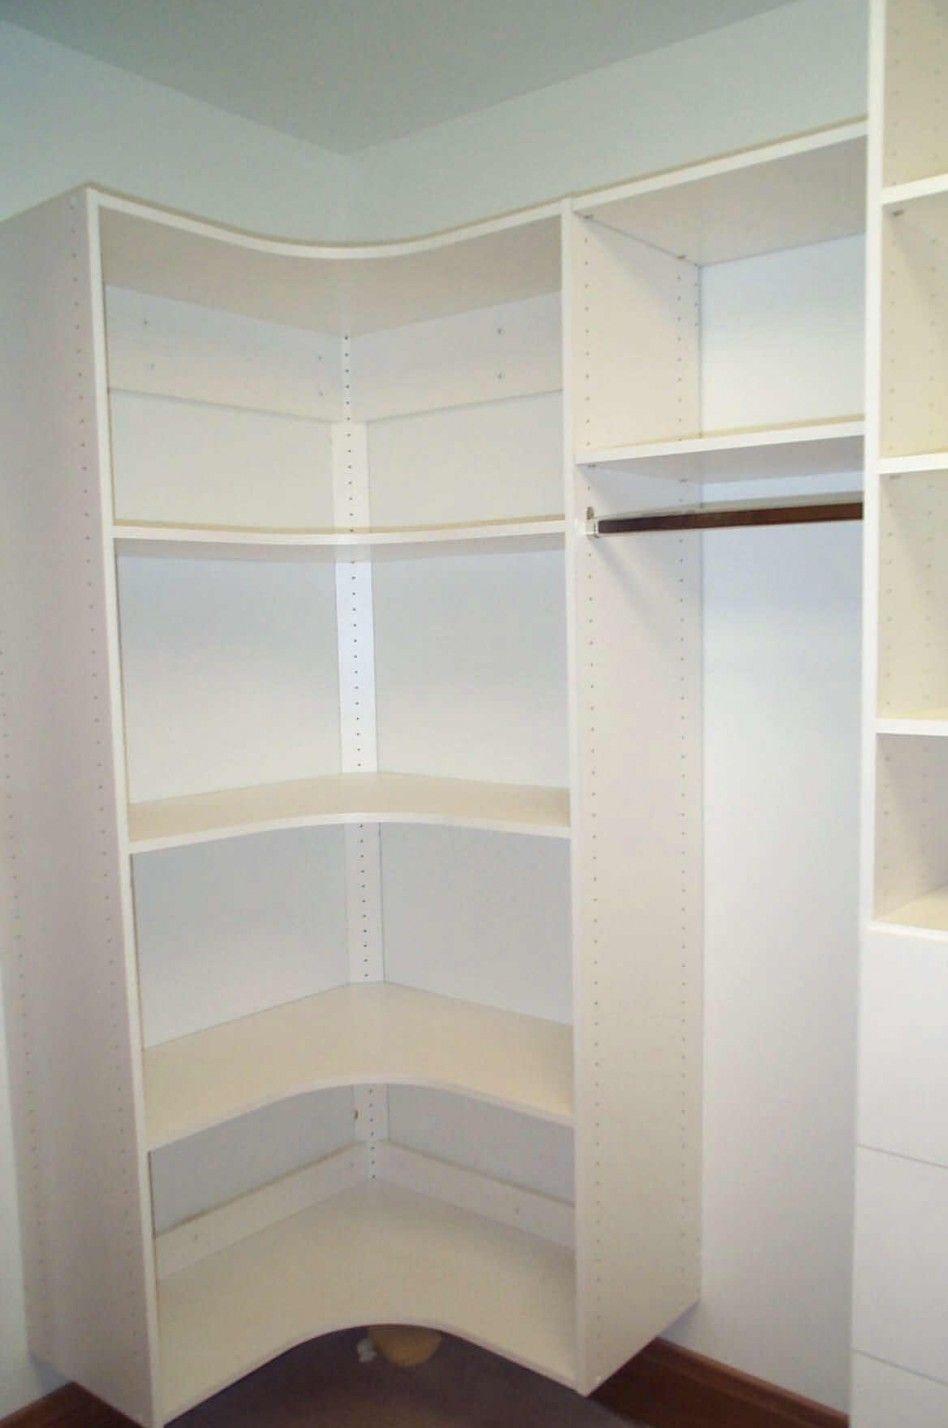 Bathroom, How To Design Walk In Closet Chic and Elegant: Wonderful ...